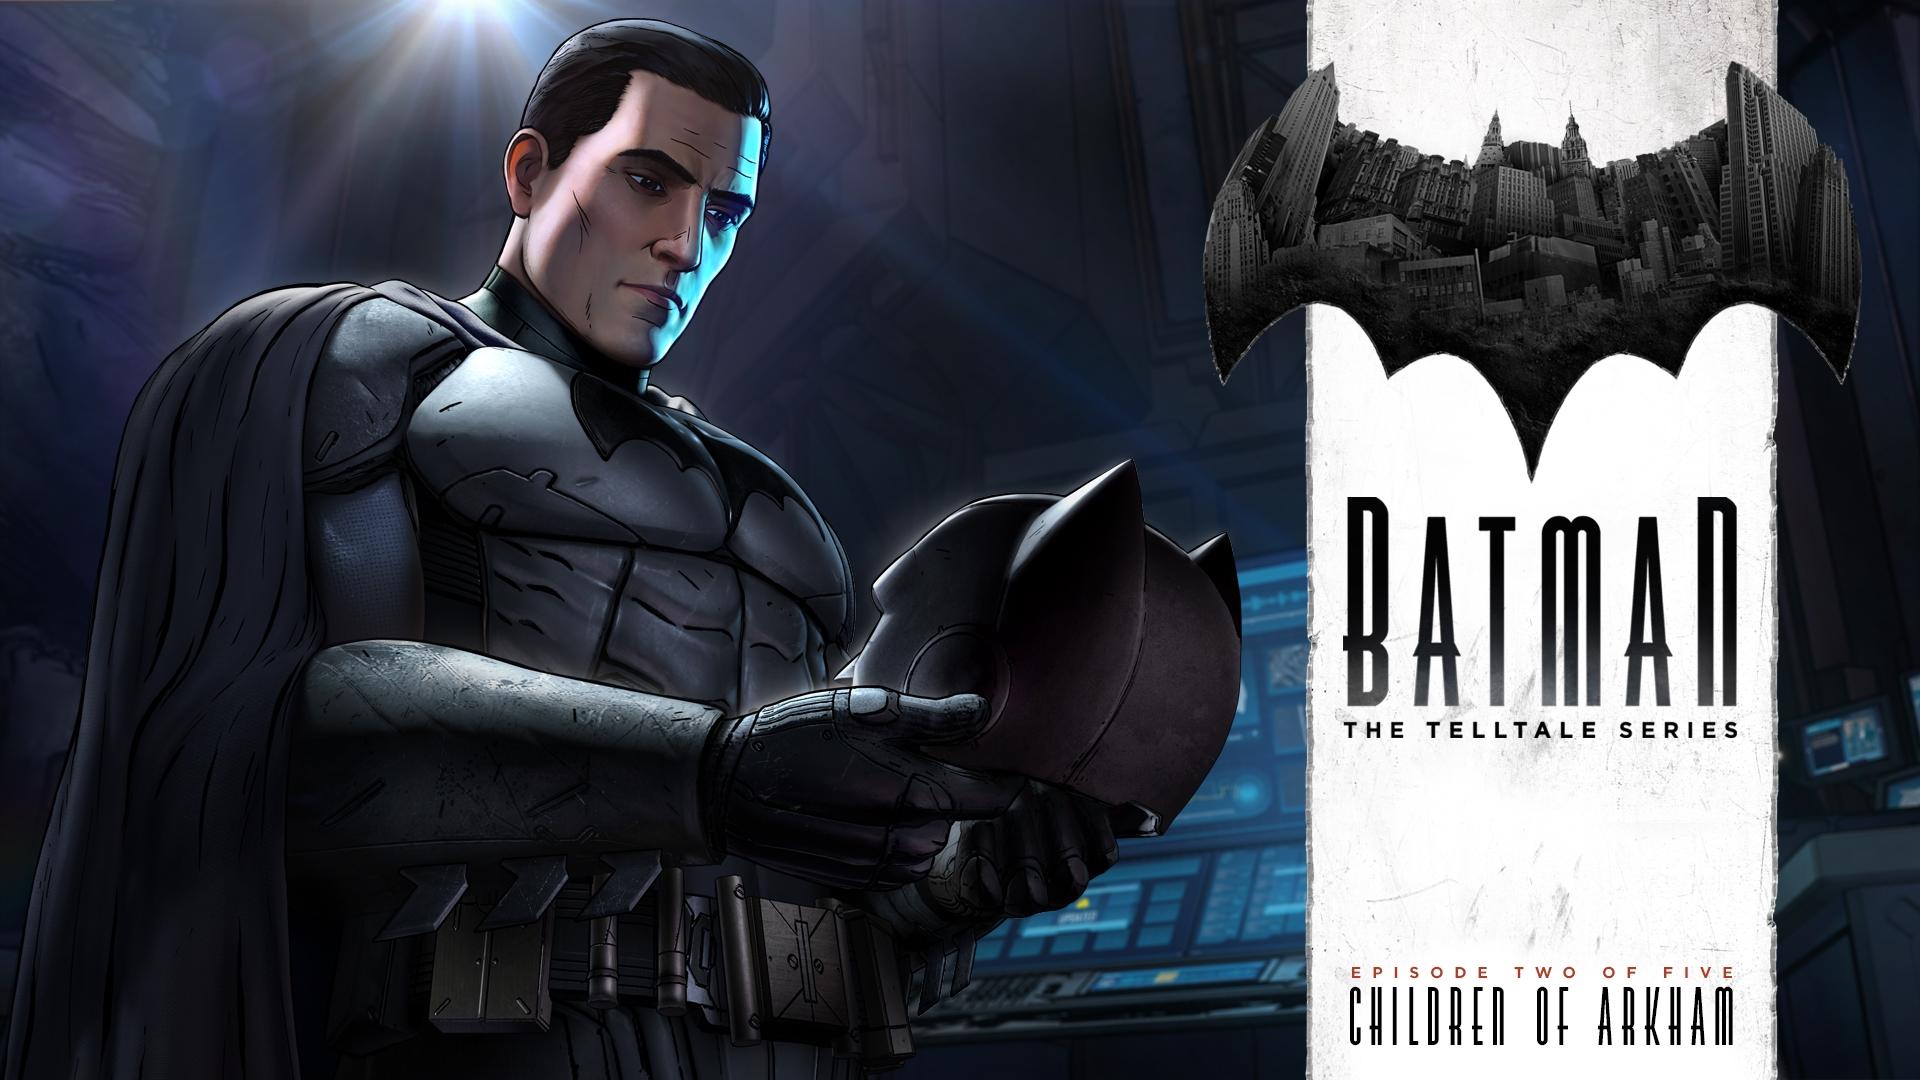 Batman: The Telltale Series Episode 2 review – Children of Arkham